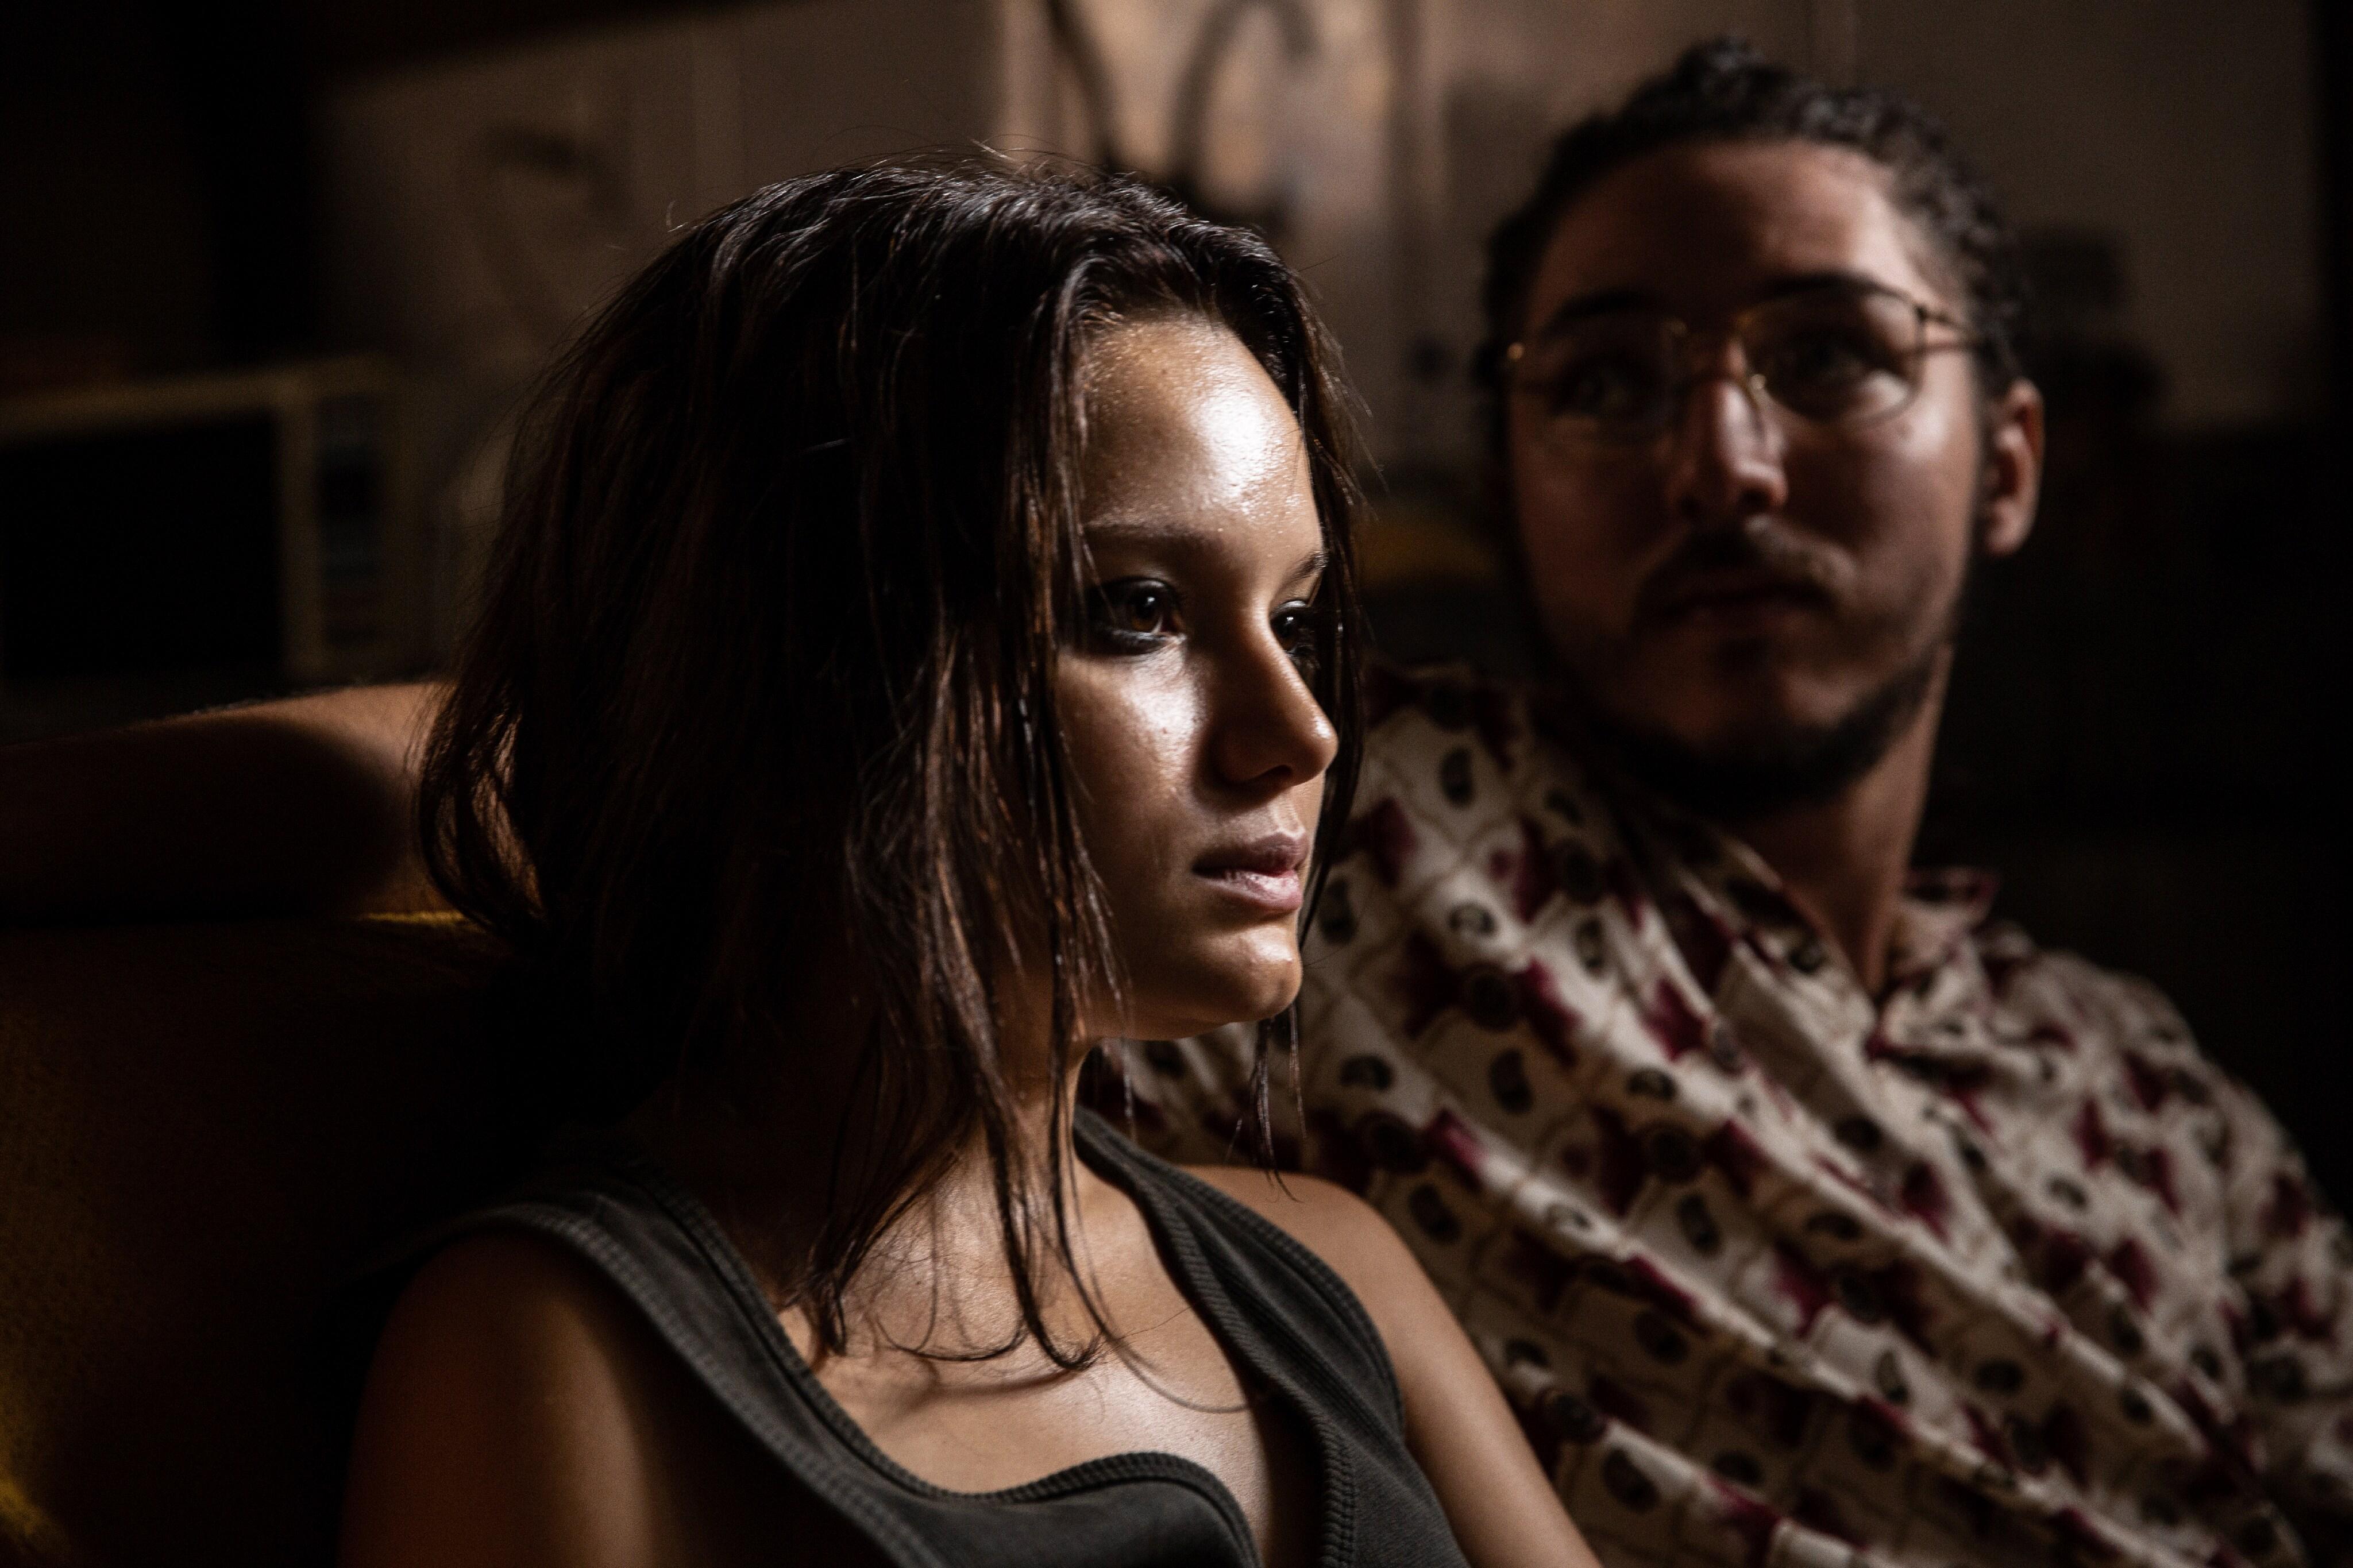 Inês (Karize Brum) e Afonso (João Vitor Silva) - Foto de Rachel Tanugi